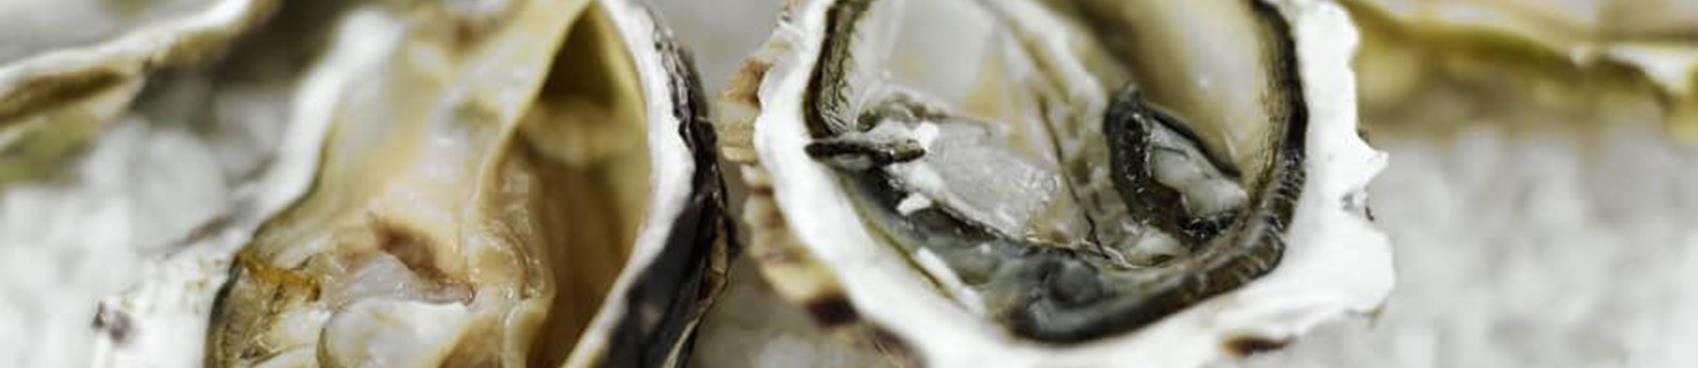 Oyster Palooza with Drakes Bay Oyster Company